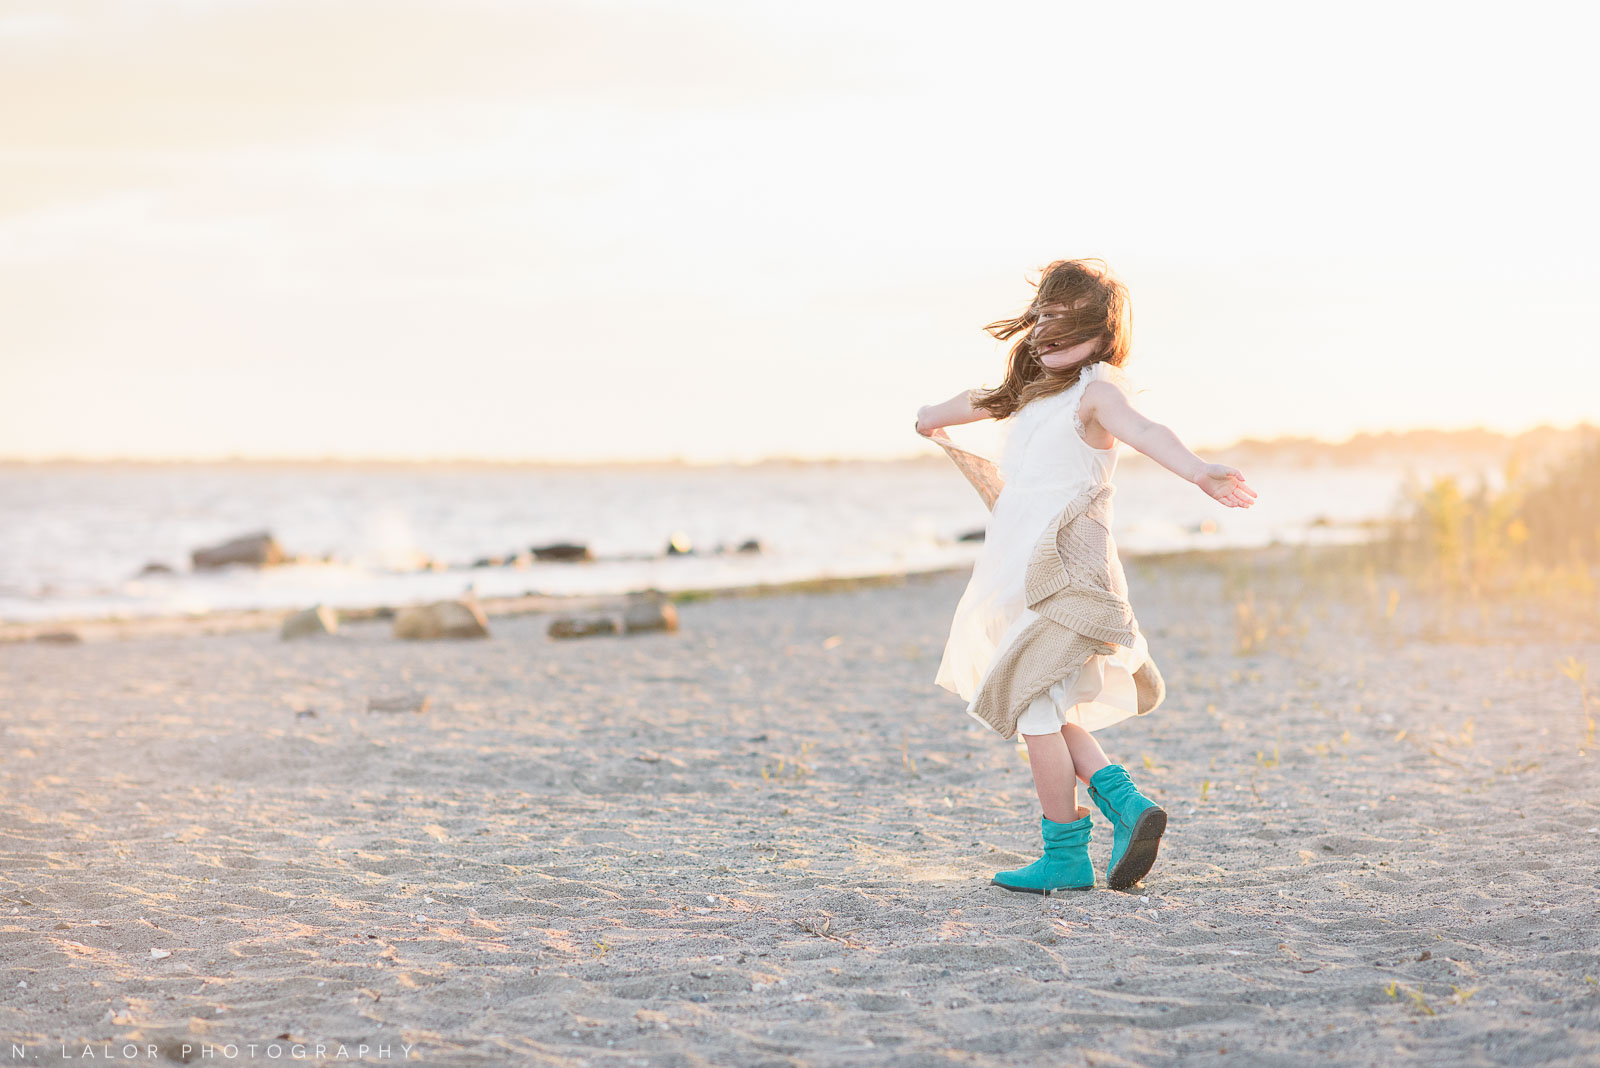 nlalor-photography-2015-10-04-gwen-beach-session-24.jpg